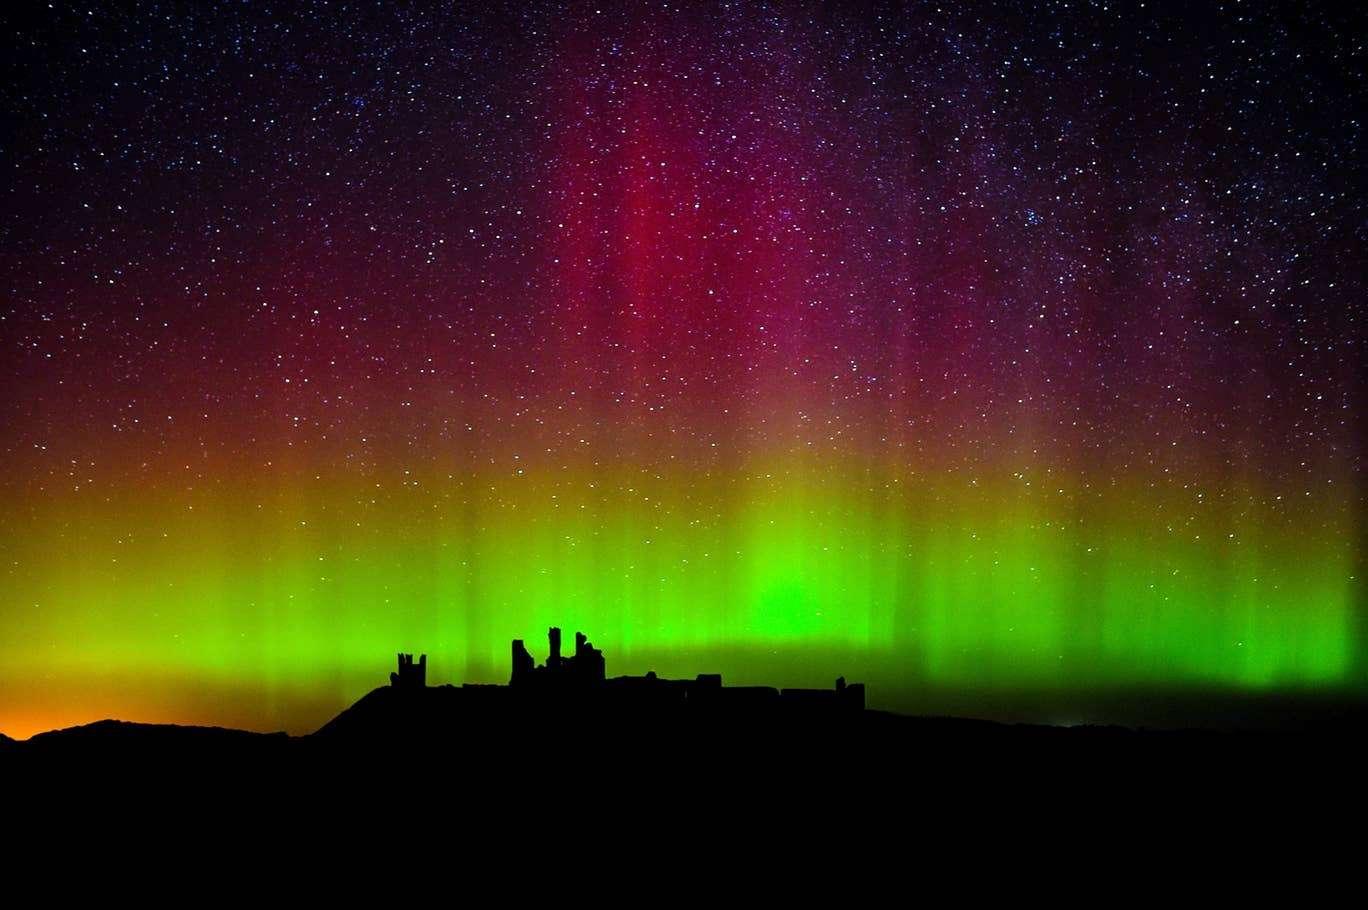 Fotos do fenômeno Aurora Boreal em Whitley Bay, Reino Unido